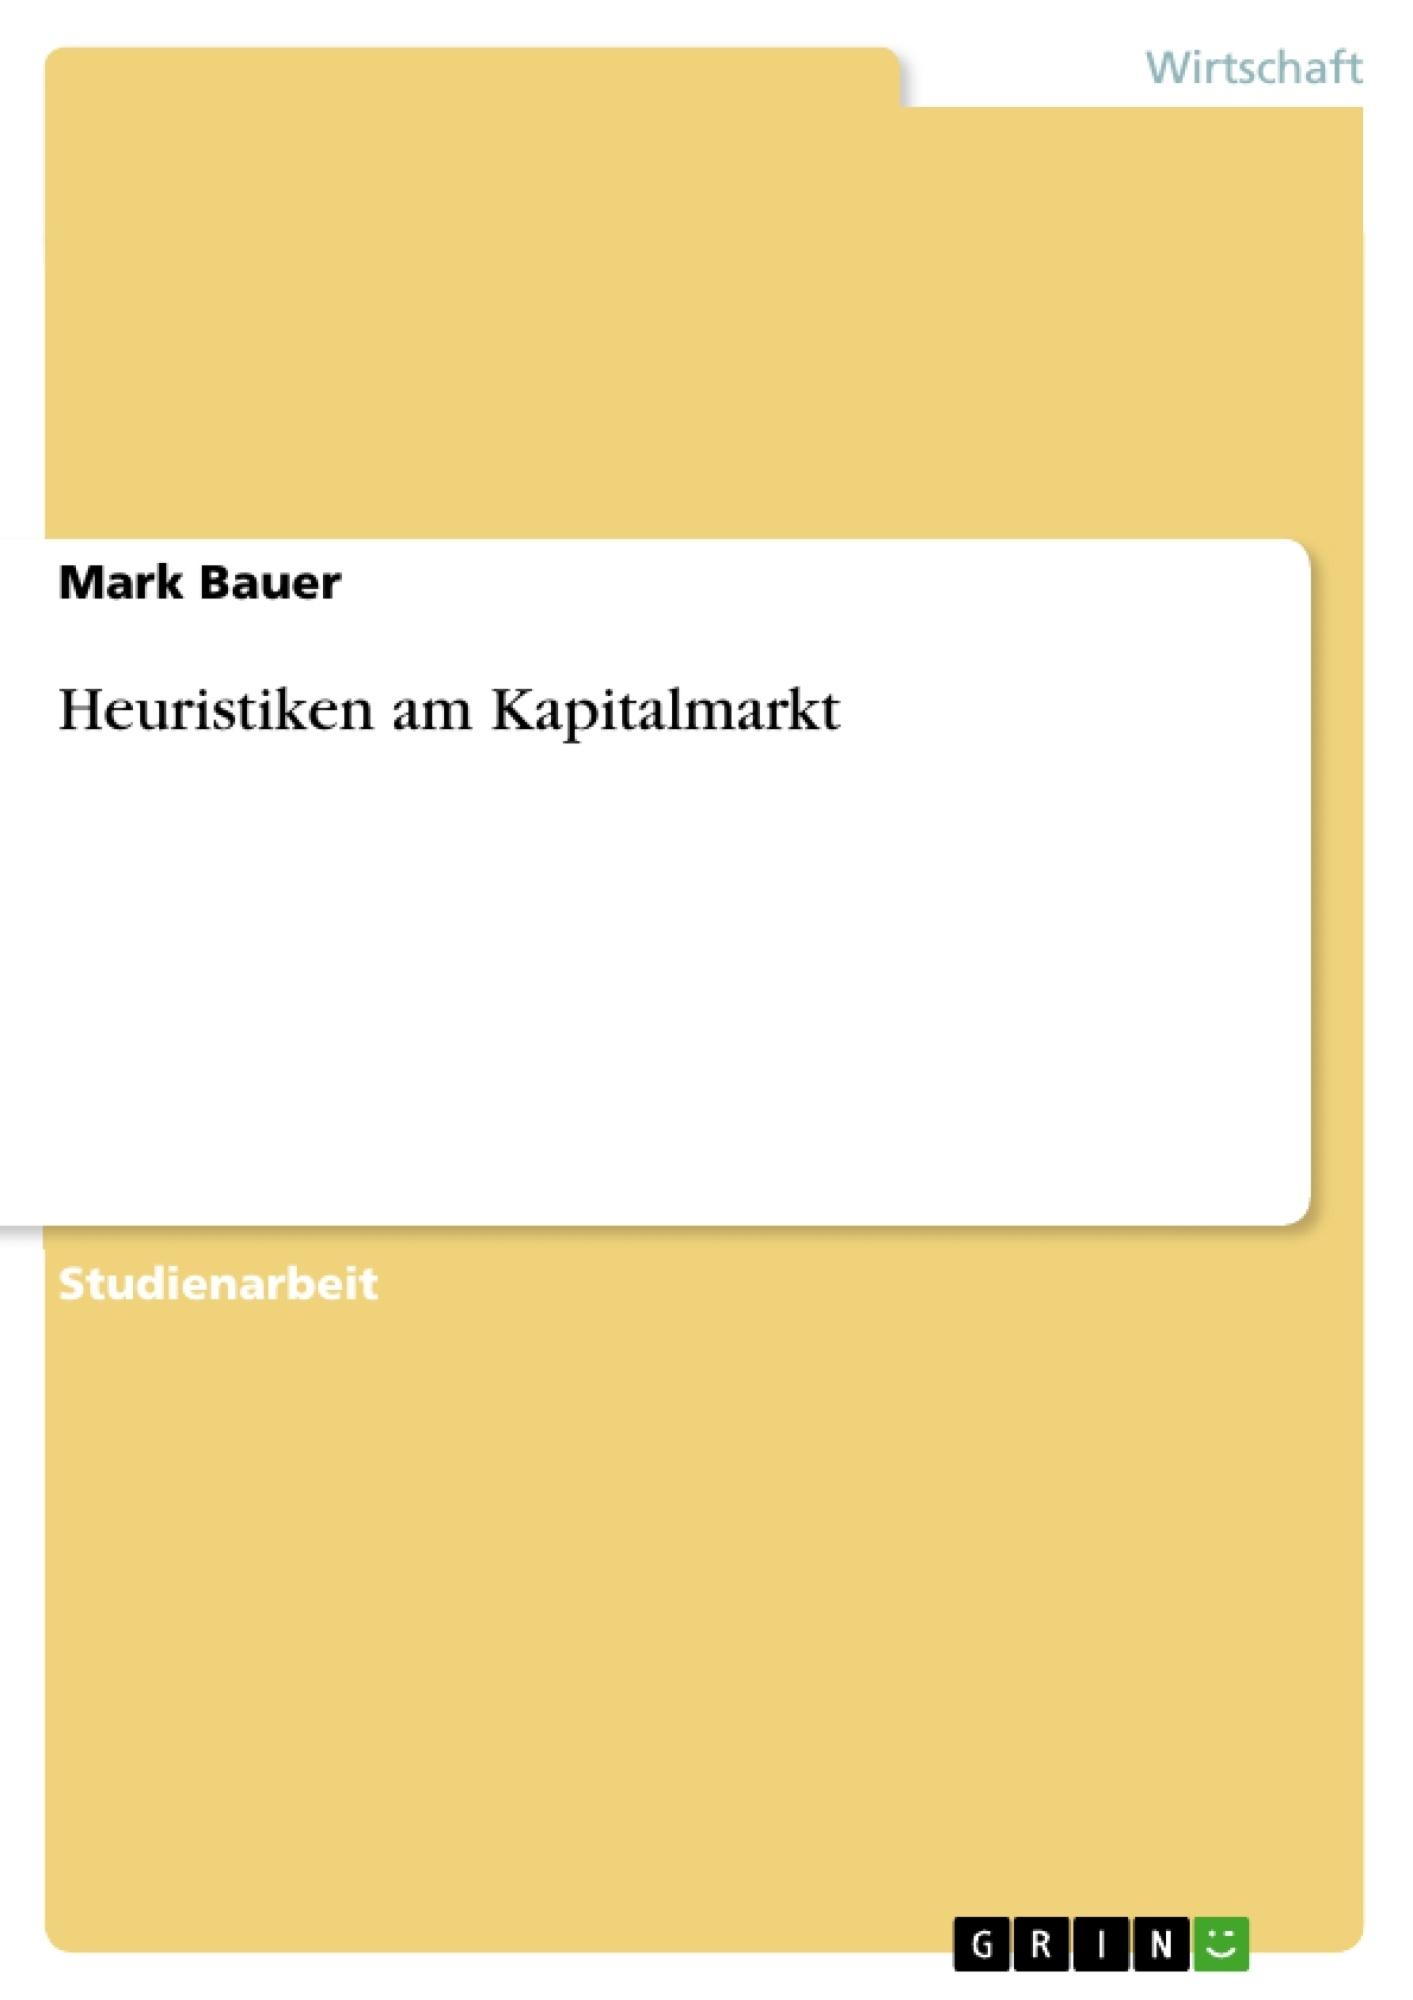 Titel: Heuristiken am Kapitalmarkt